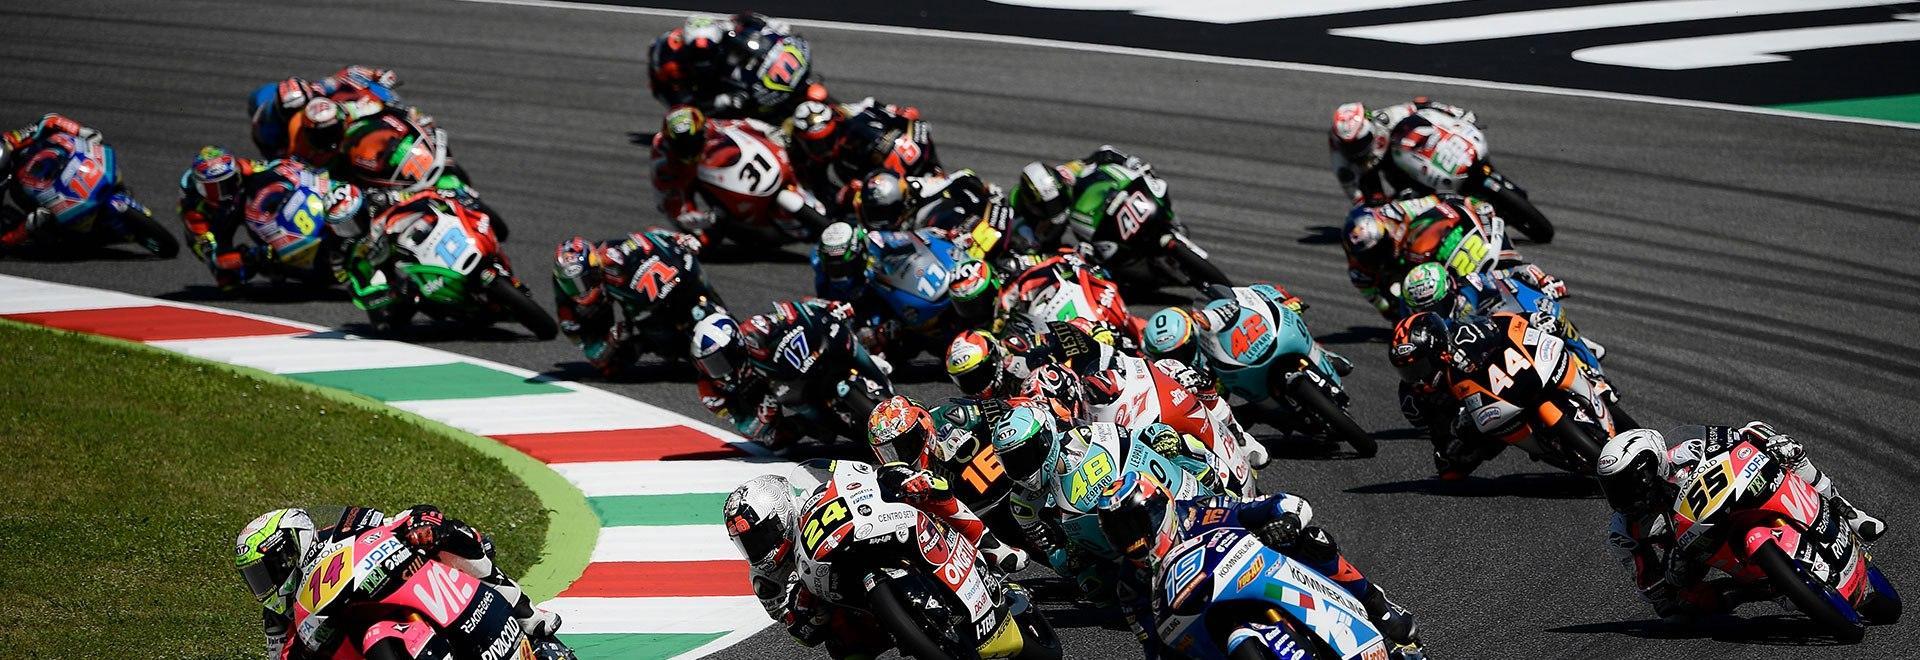 Moto3 Imola. Race 2